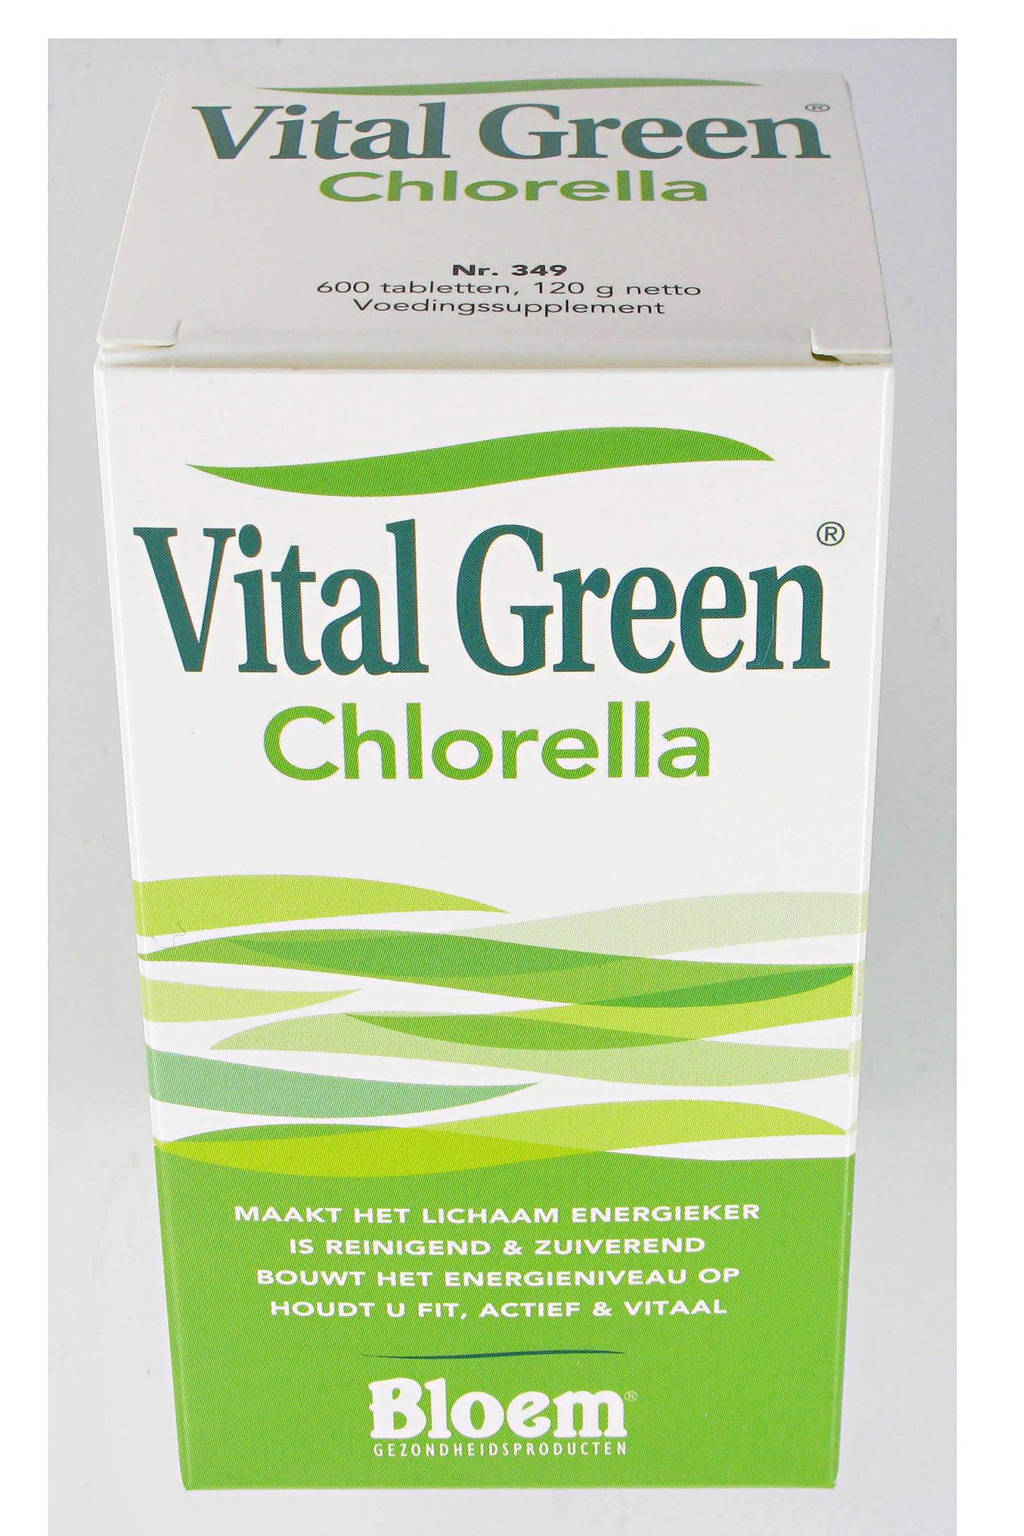 Bloem Vital Green Chlorella vitaminen - 600 stuks